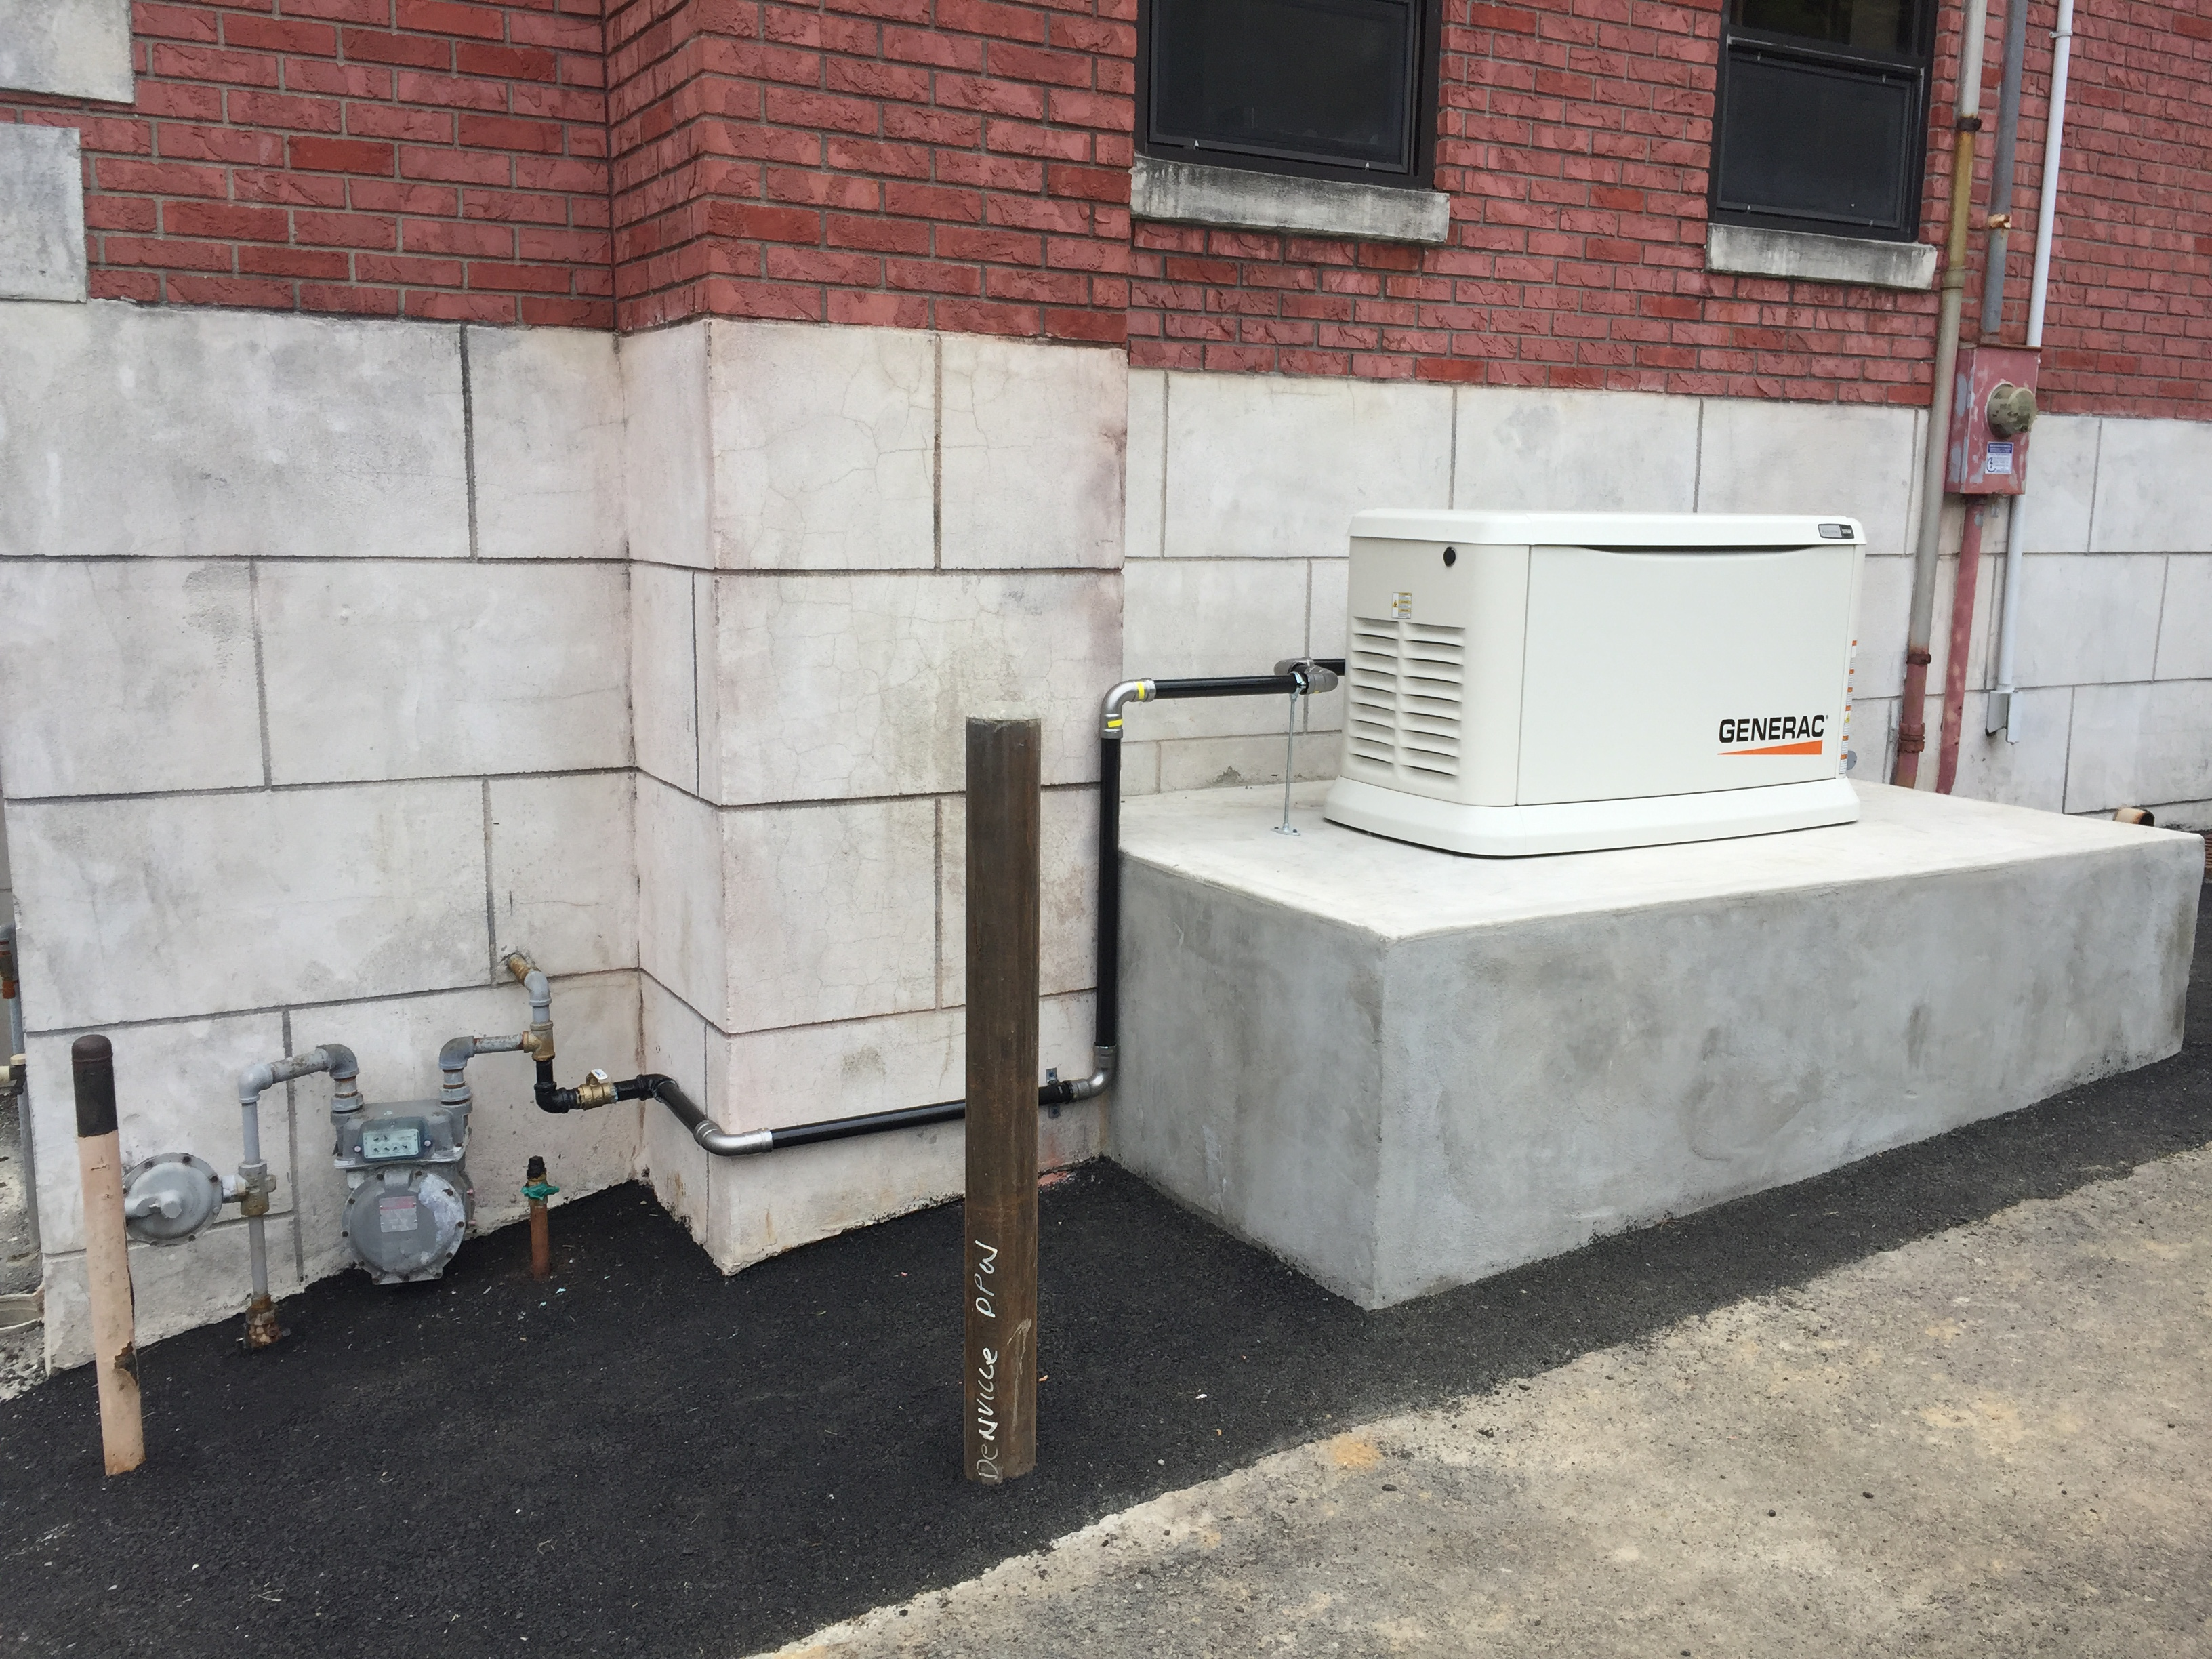 Installation of a 22kw Generac generator - Denville, NJ